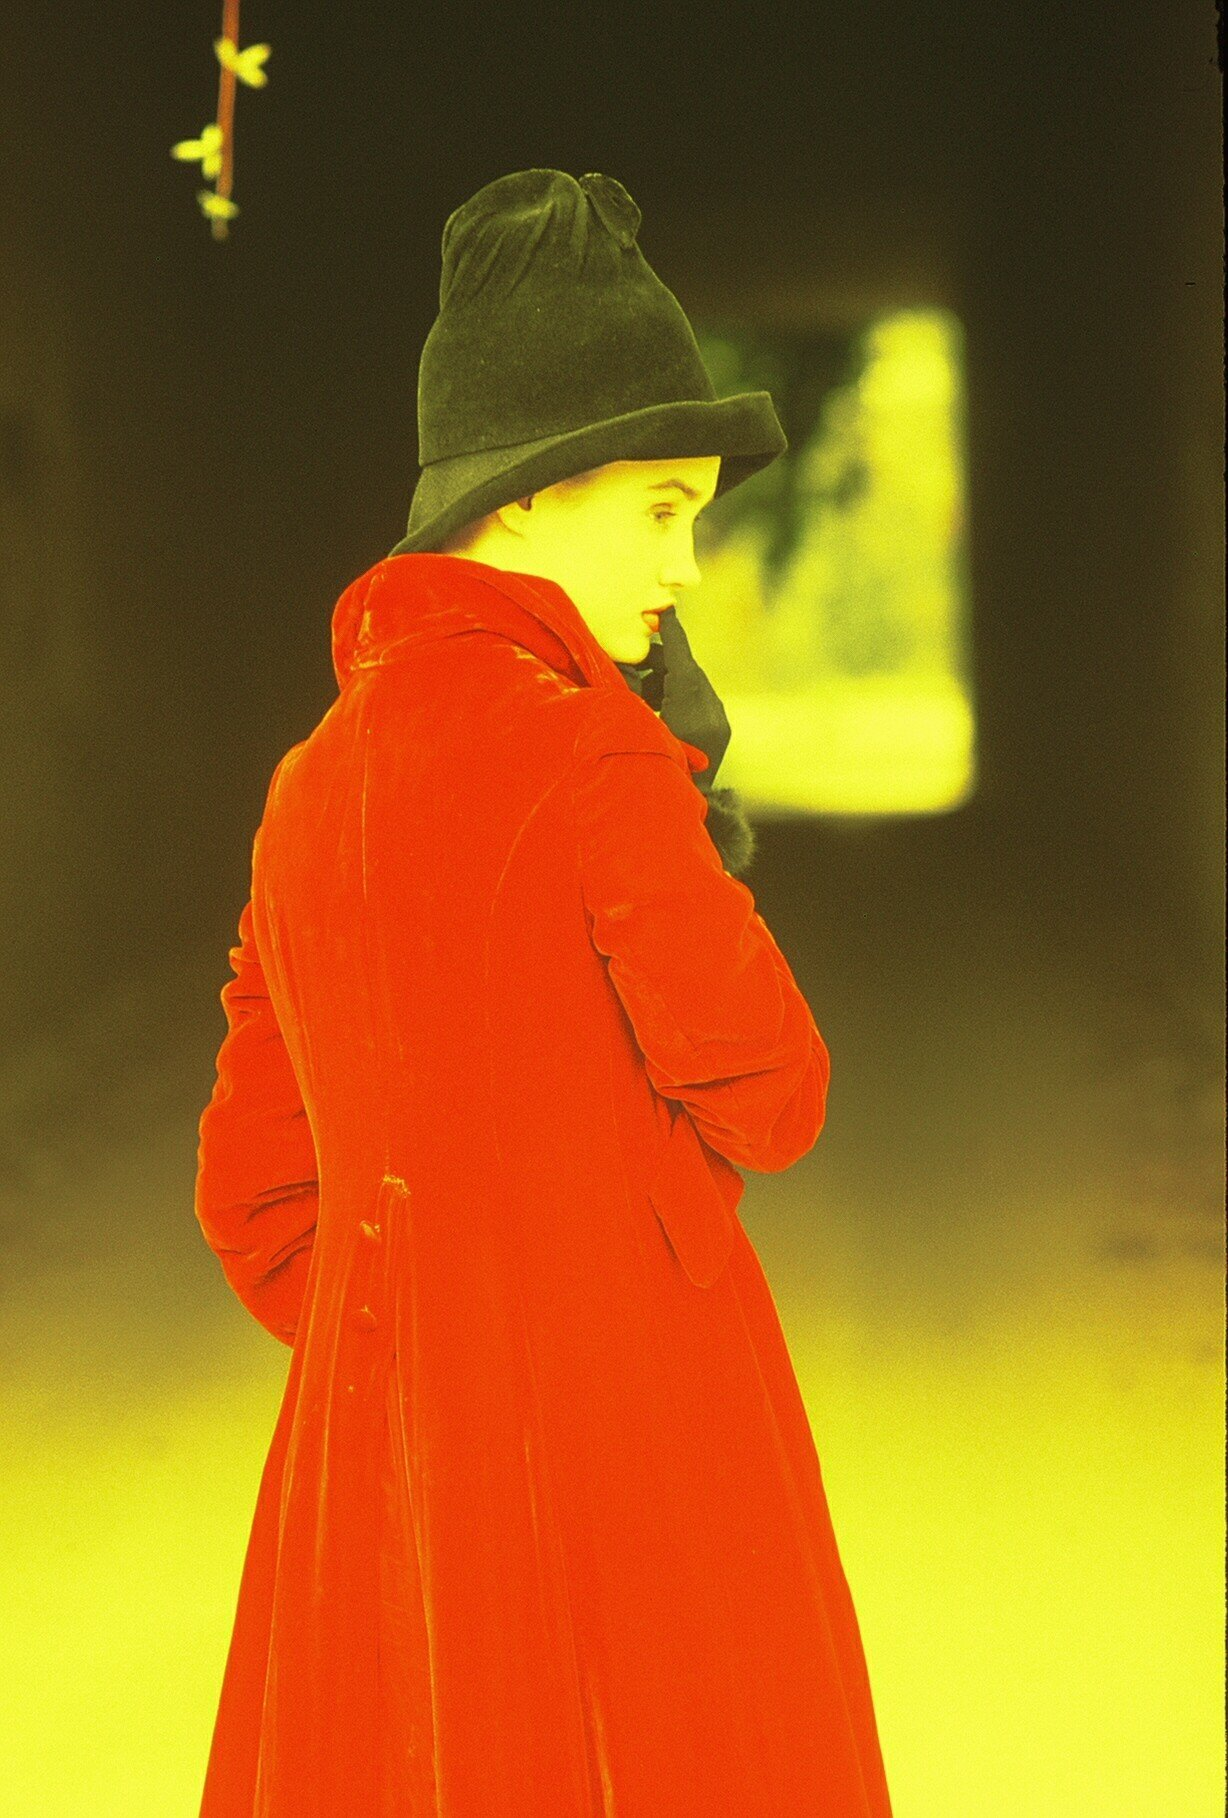 JENNIFER WILSON - International fashion, print model in JAPAN. She has starred in international fashion campaigns.